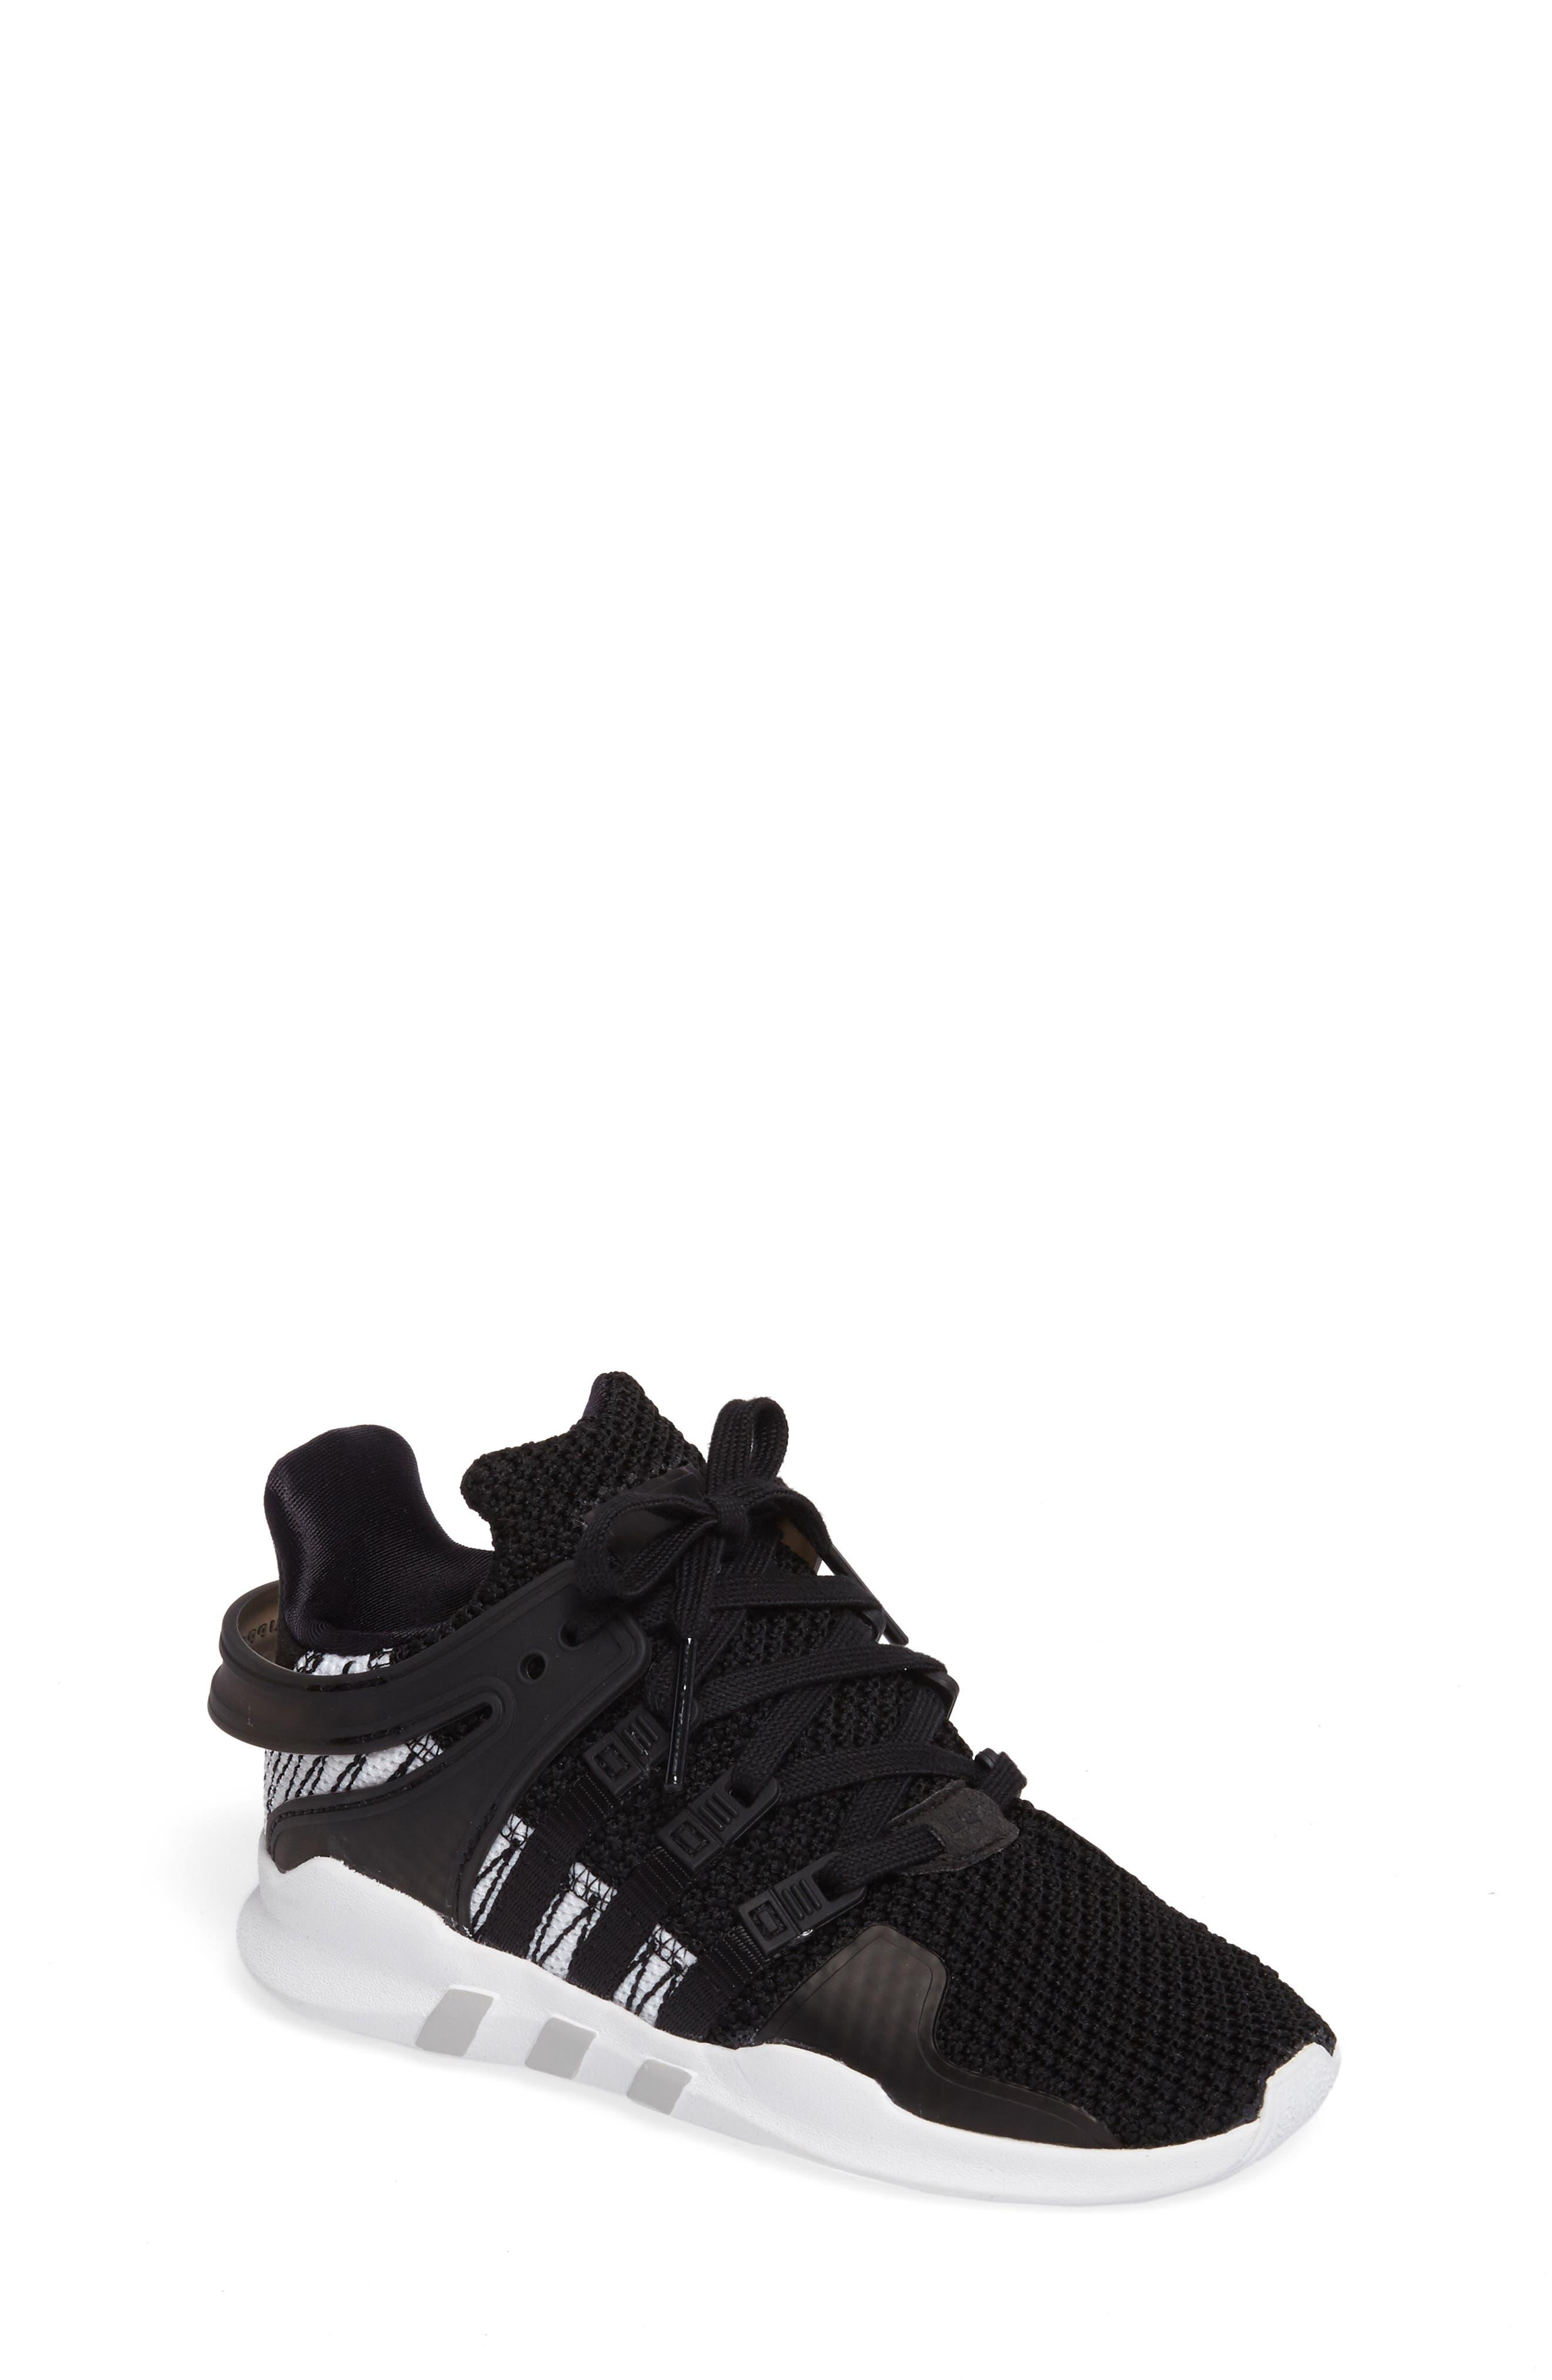 ADIDAS EQT Support ADV I Sneaker